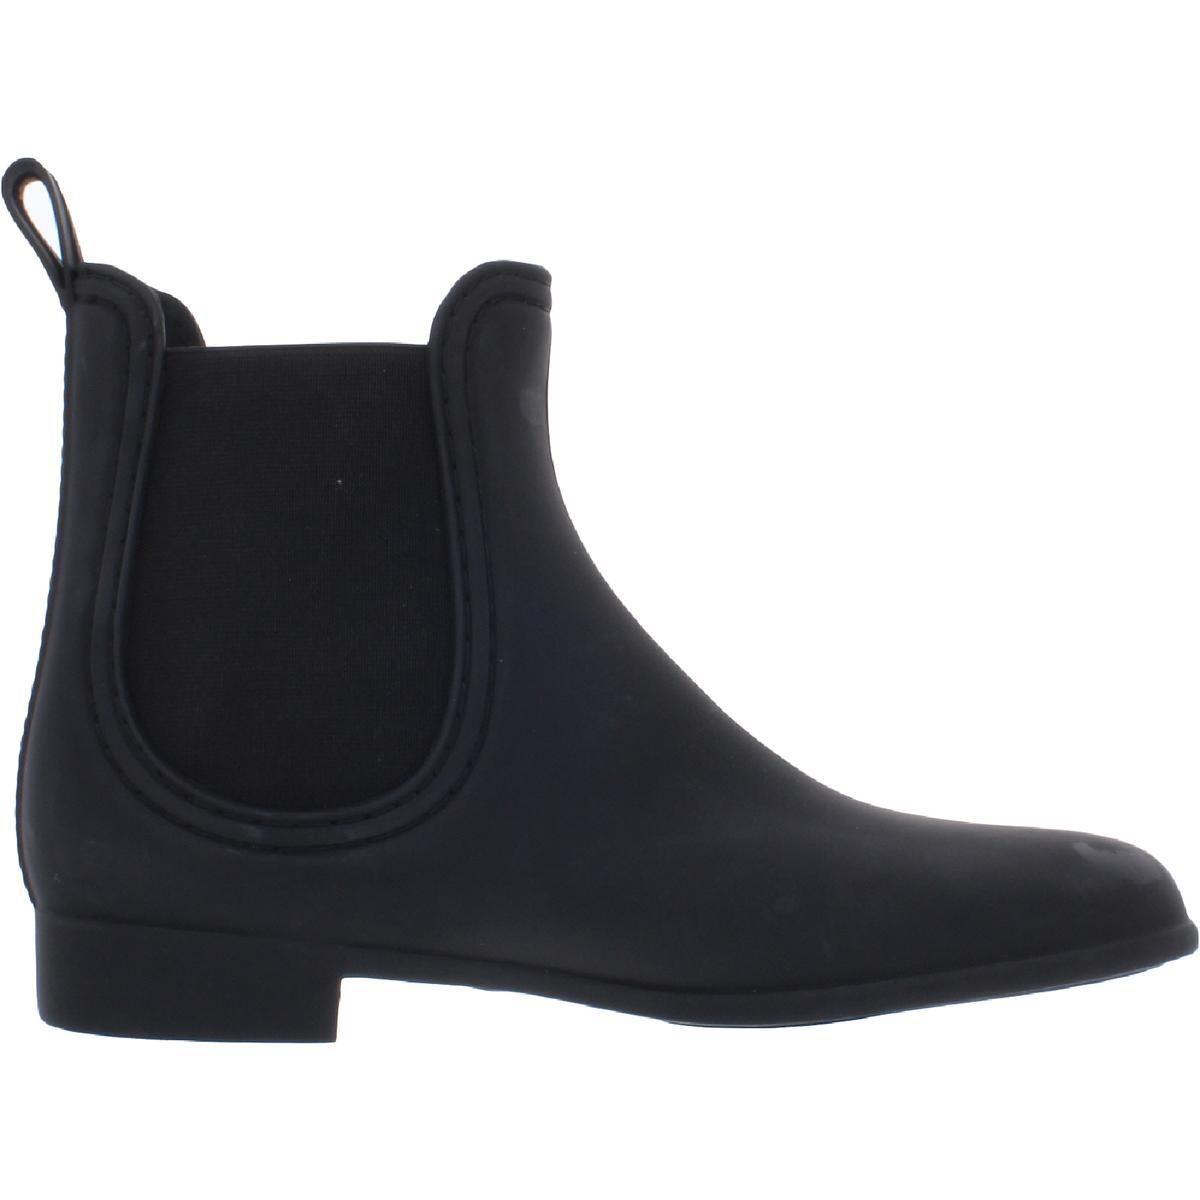 JC Play by Jeffery Campbell Womens Chelsea Boots Black Size 7 Medium (B,M)